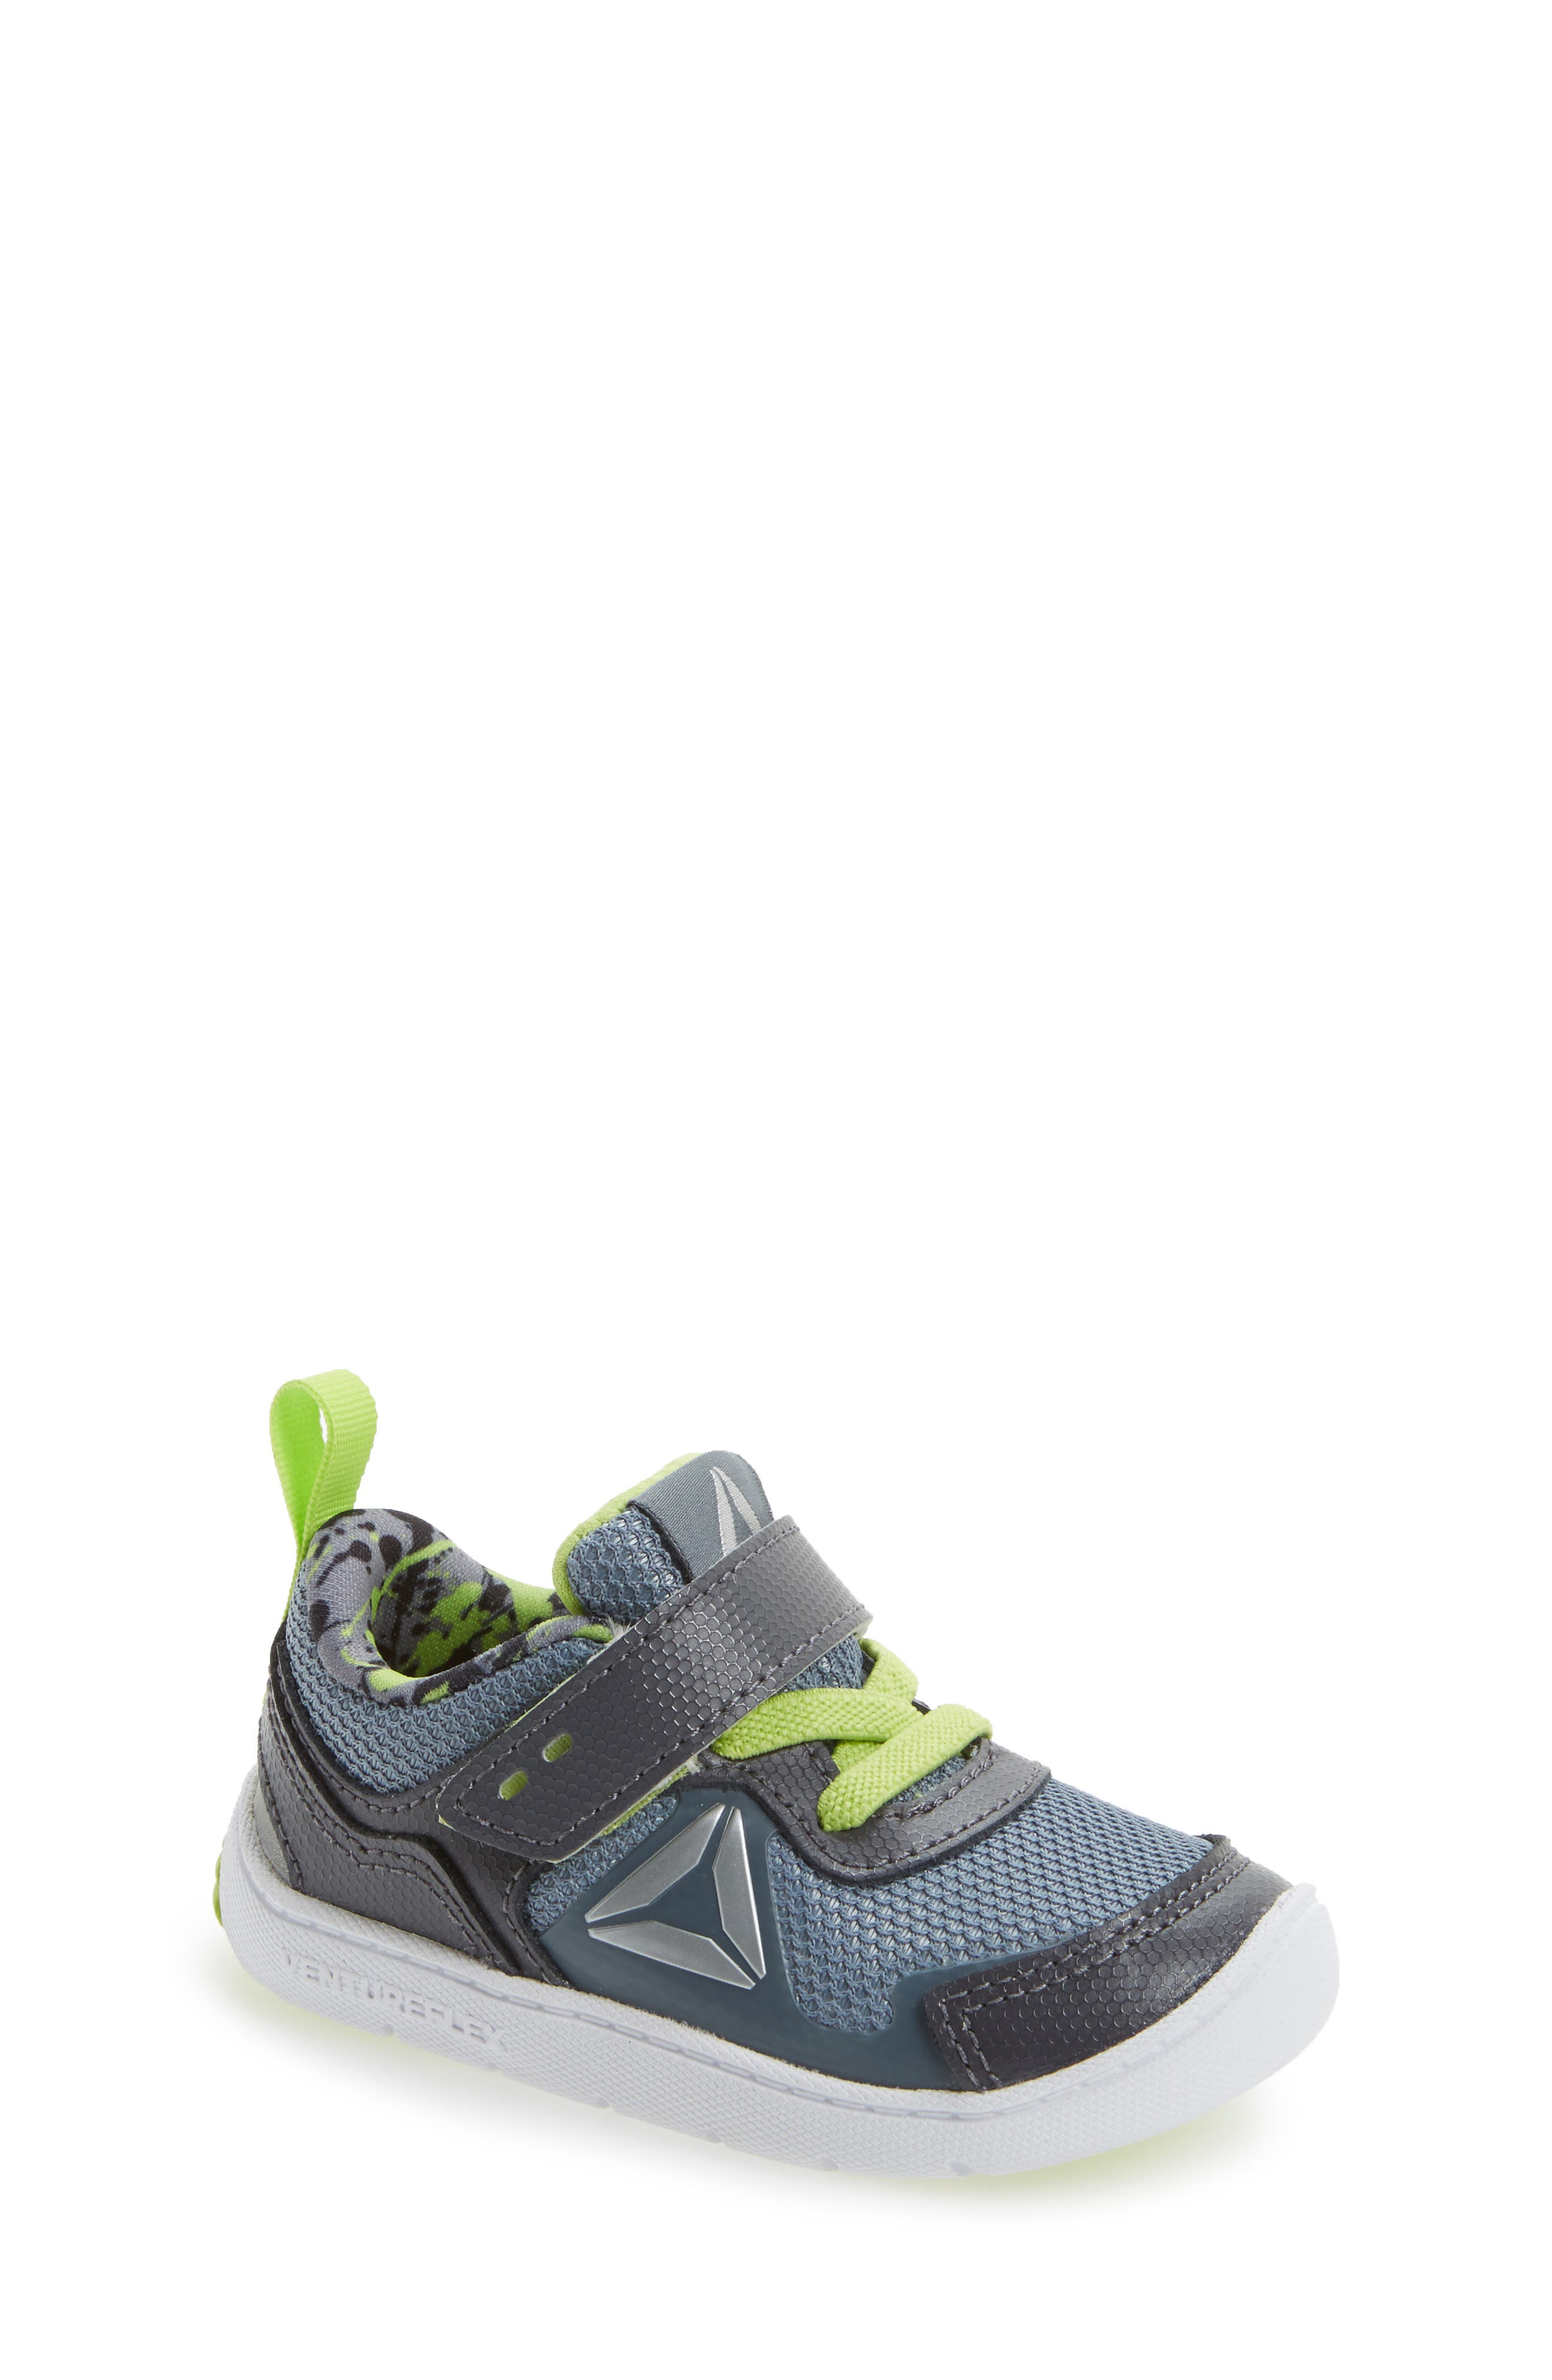 Ventureflex Stride 5.0 Sneaker,                             Main thumbnail 1, color,                             020